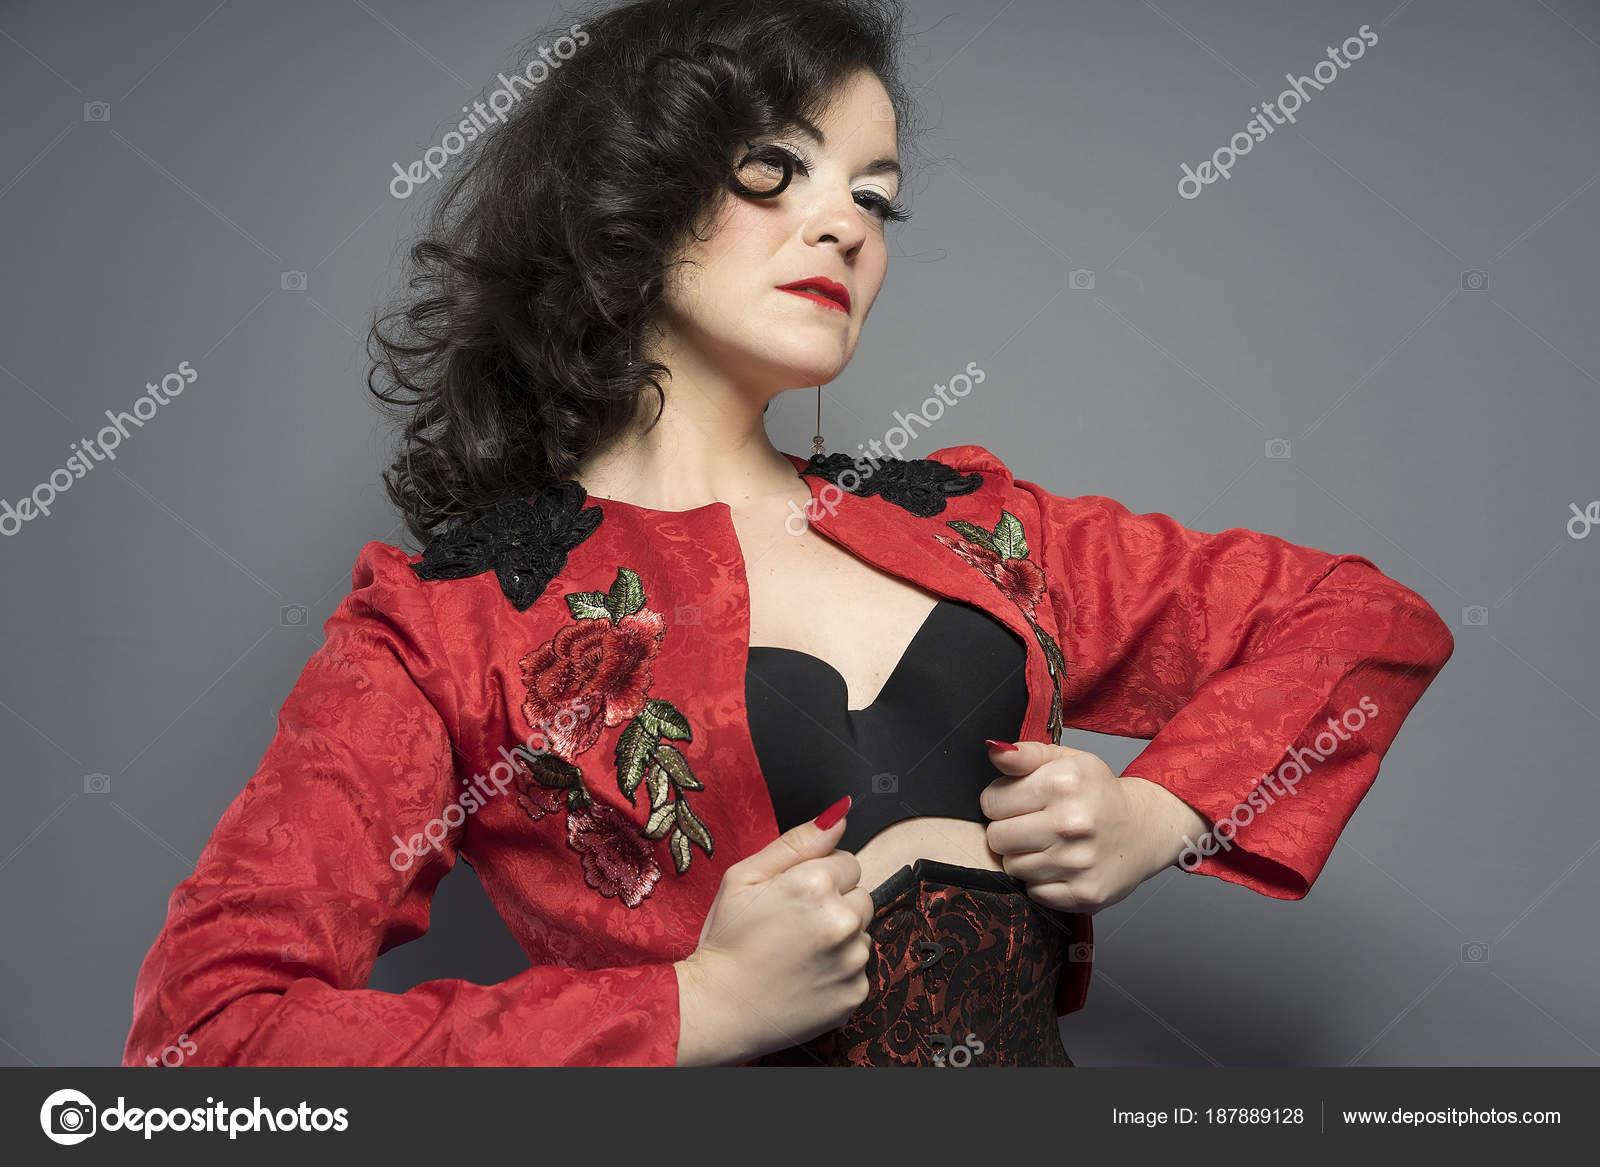 Mujer Bailarín Español Típica Con Chaqueta Española Morena Flamenco aqpZxrzqE